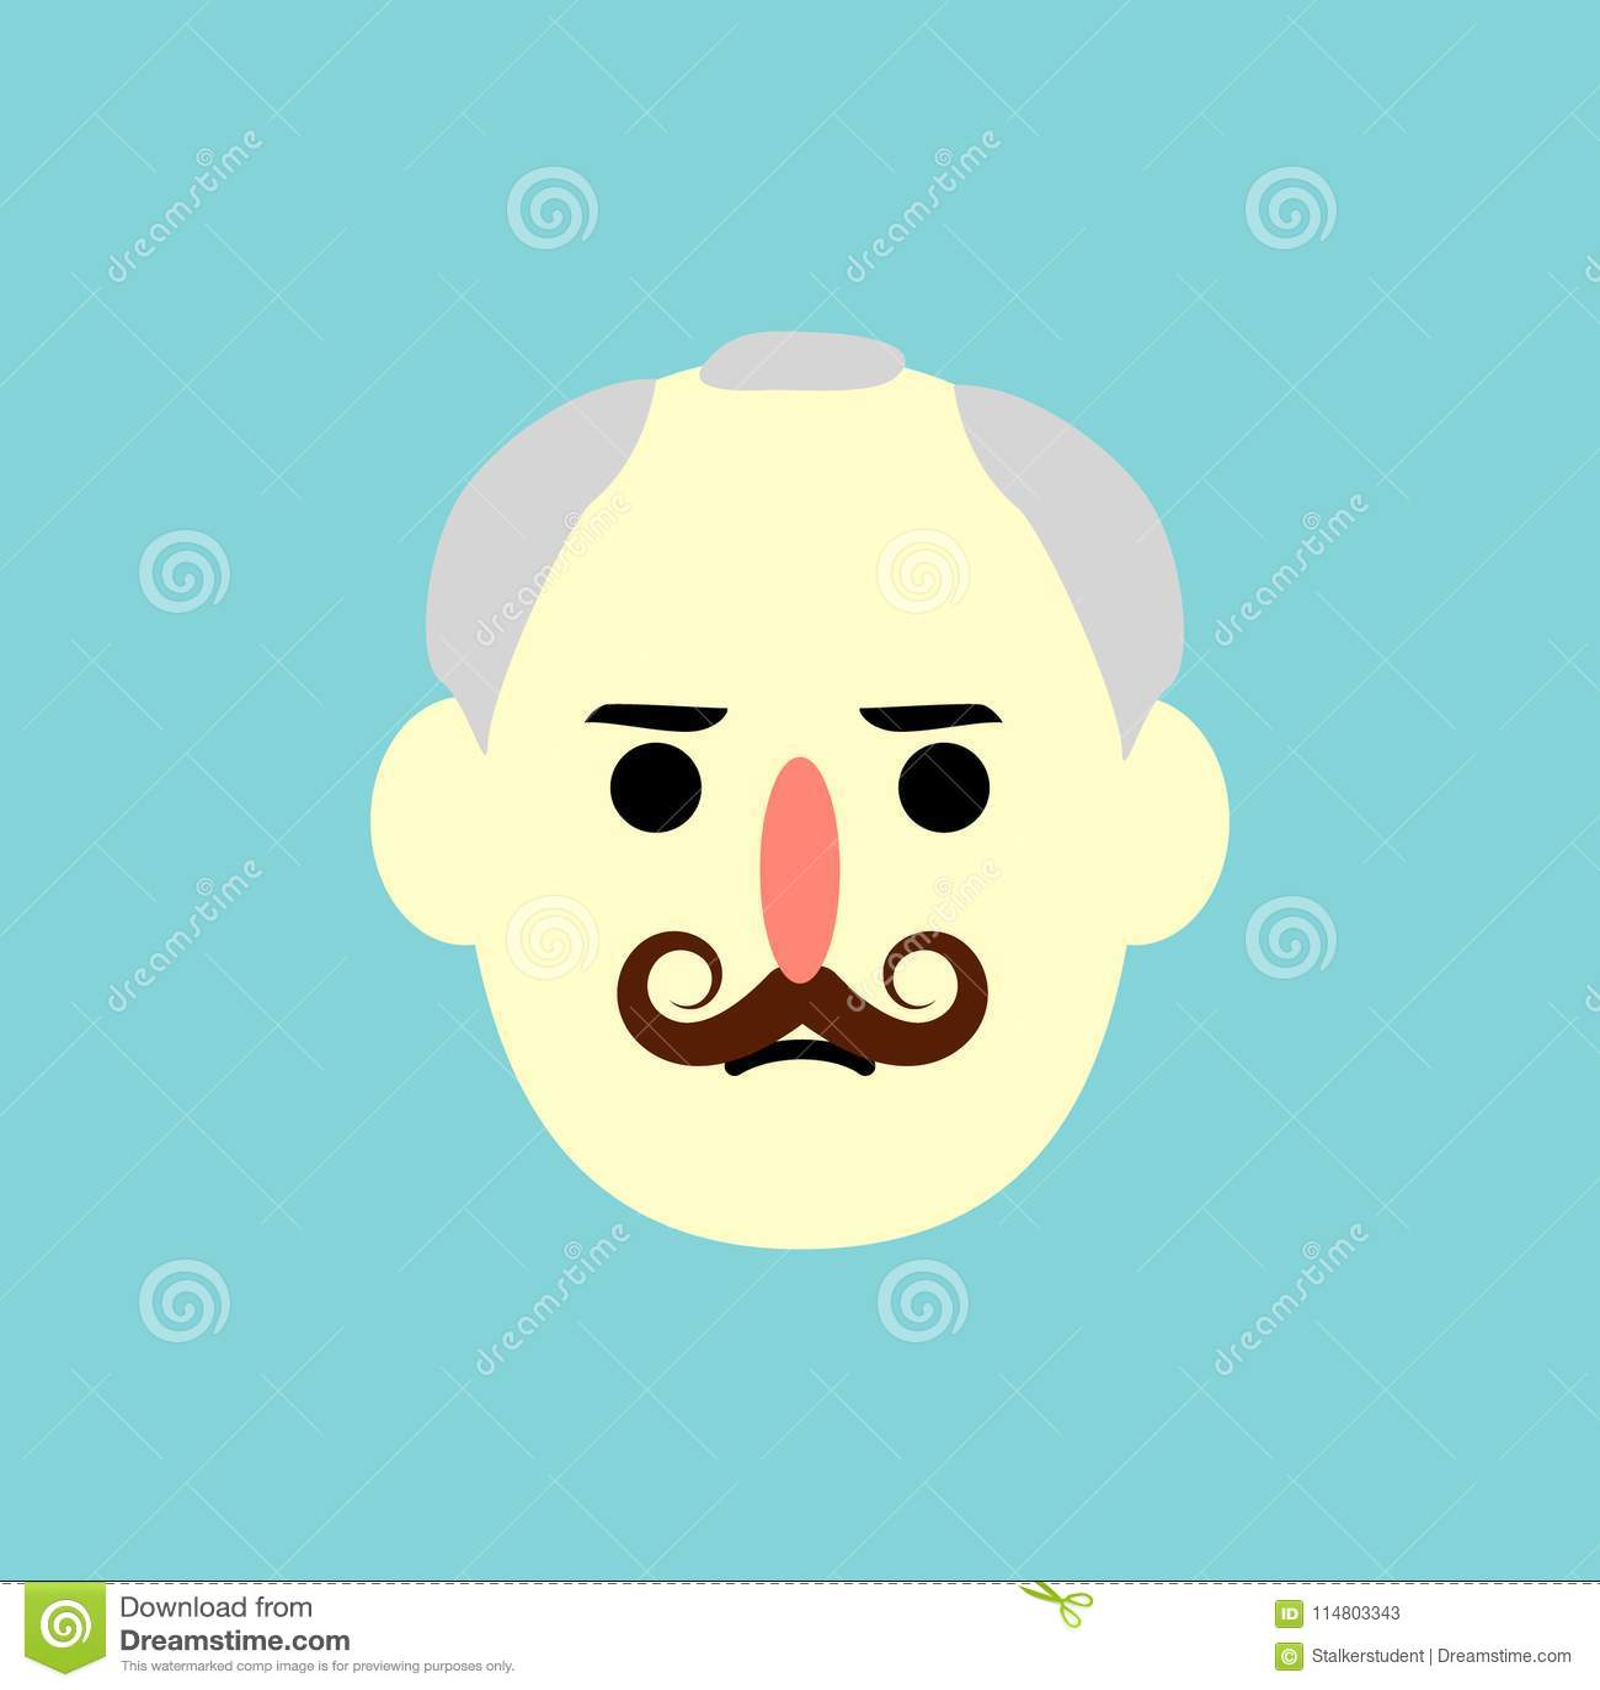 Man Face Flat Design Vector Illustration Stock Vector